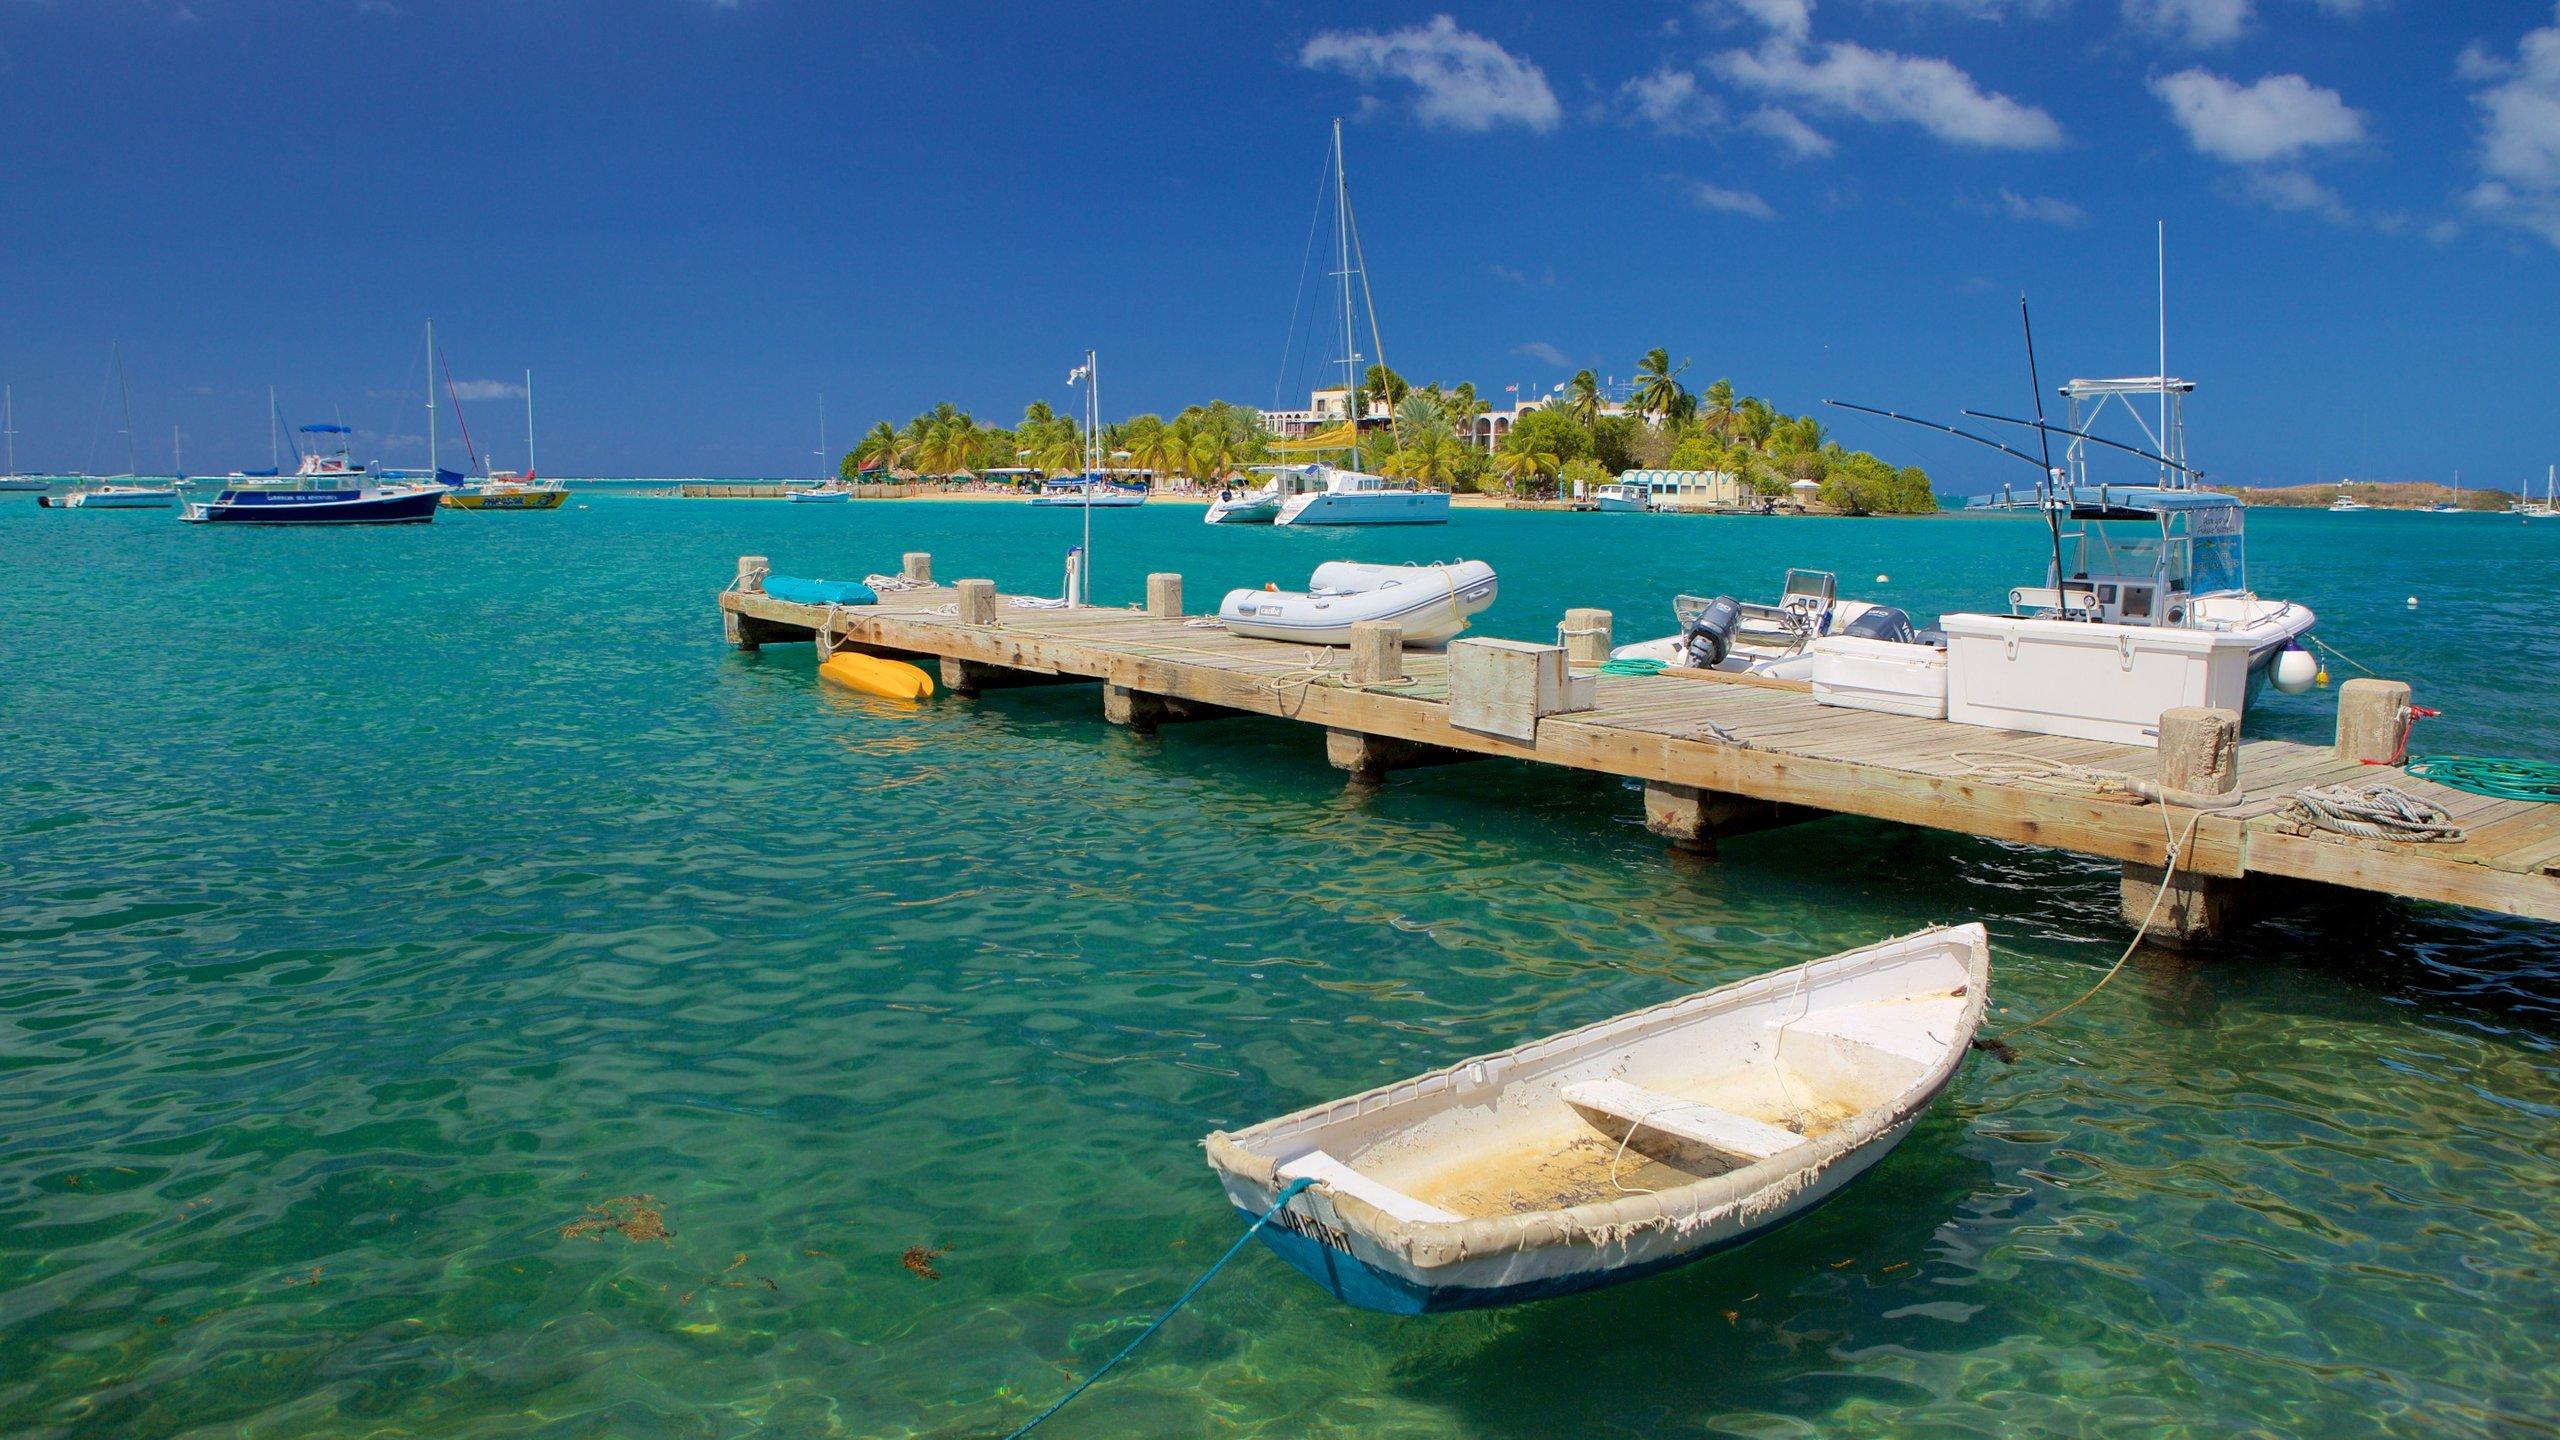 Christiansted, St. Croix Island, U.S. Virgin Islands